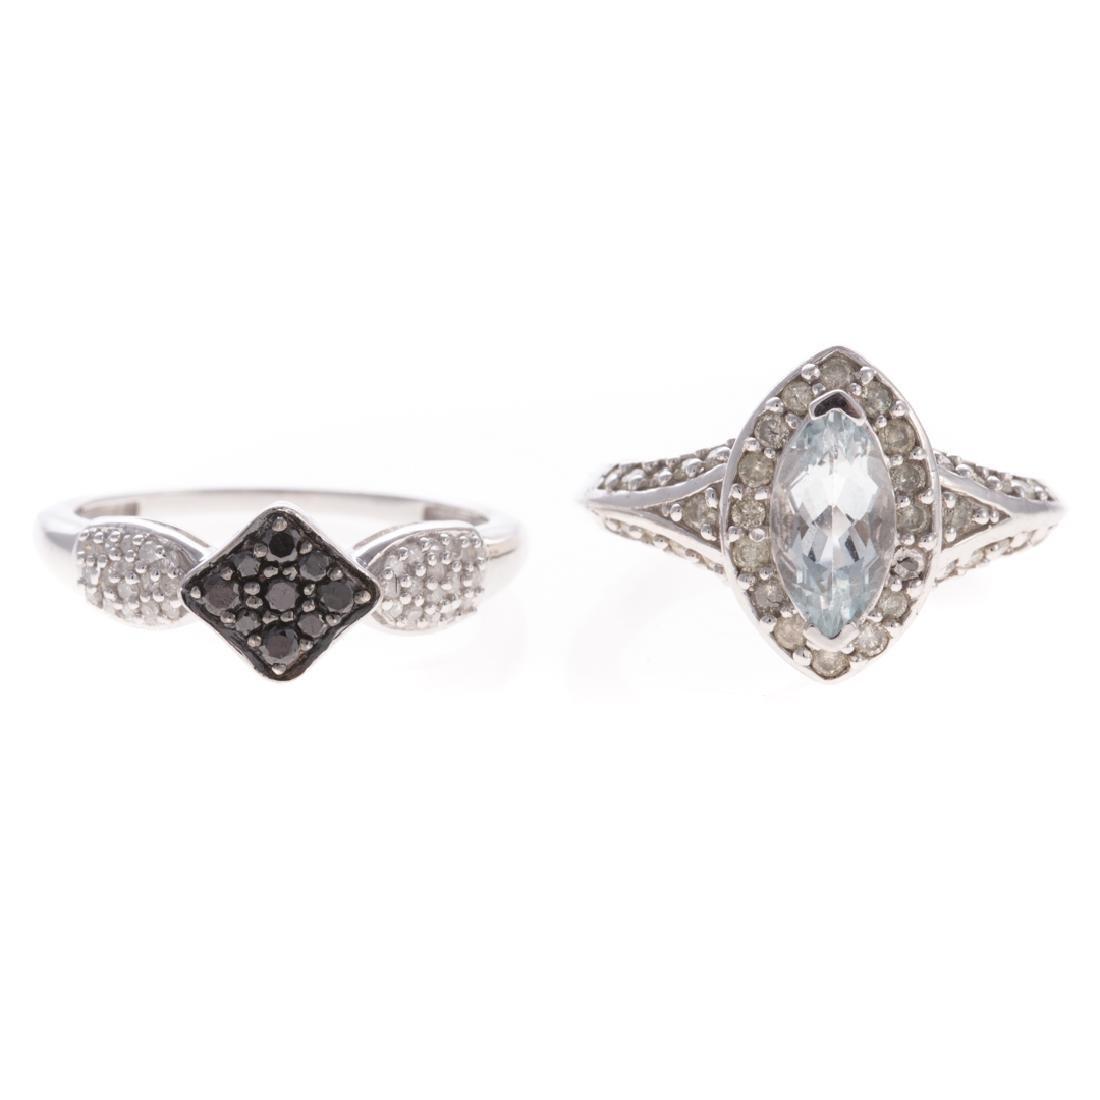 An Aquamarine Ring & Black & White Diamond Ring